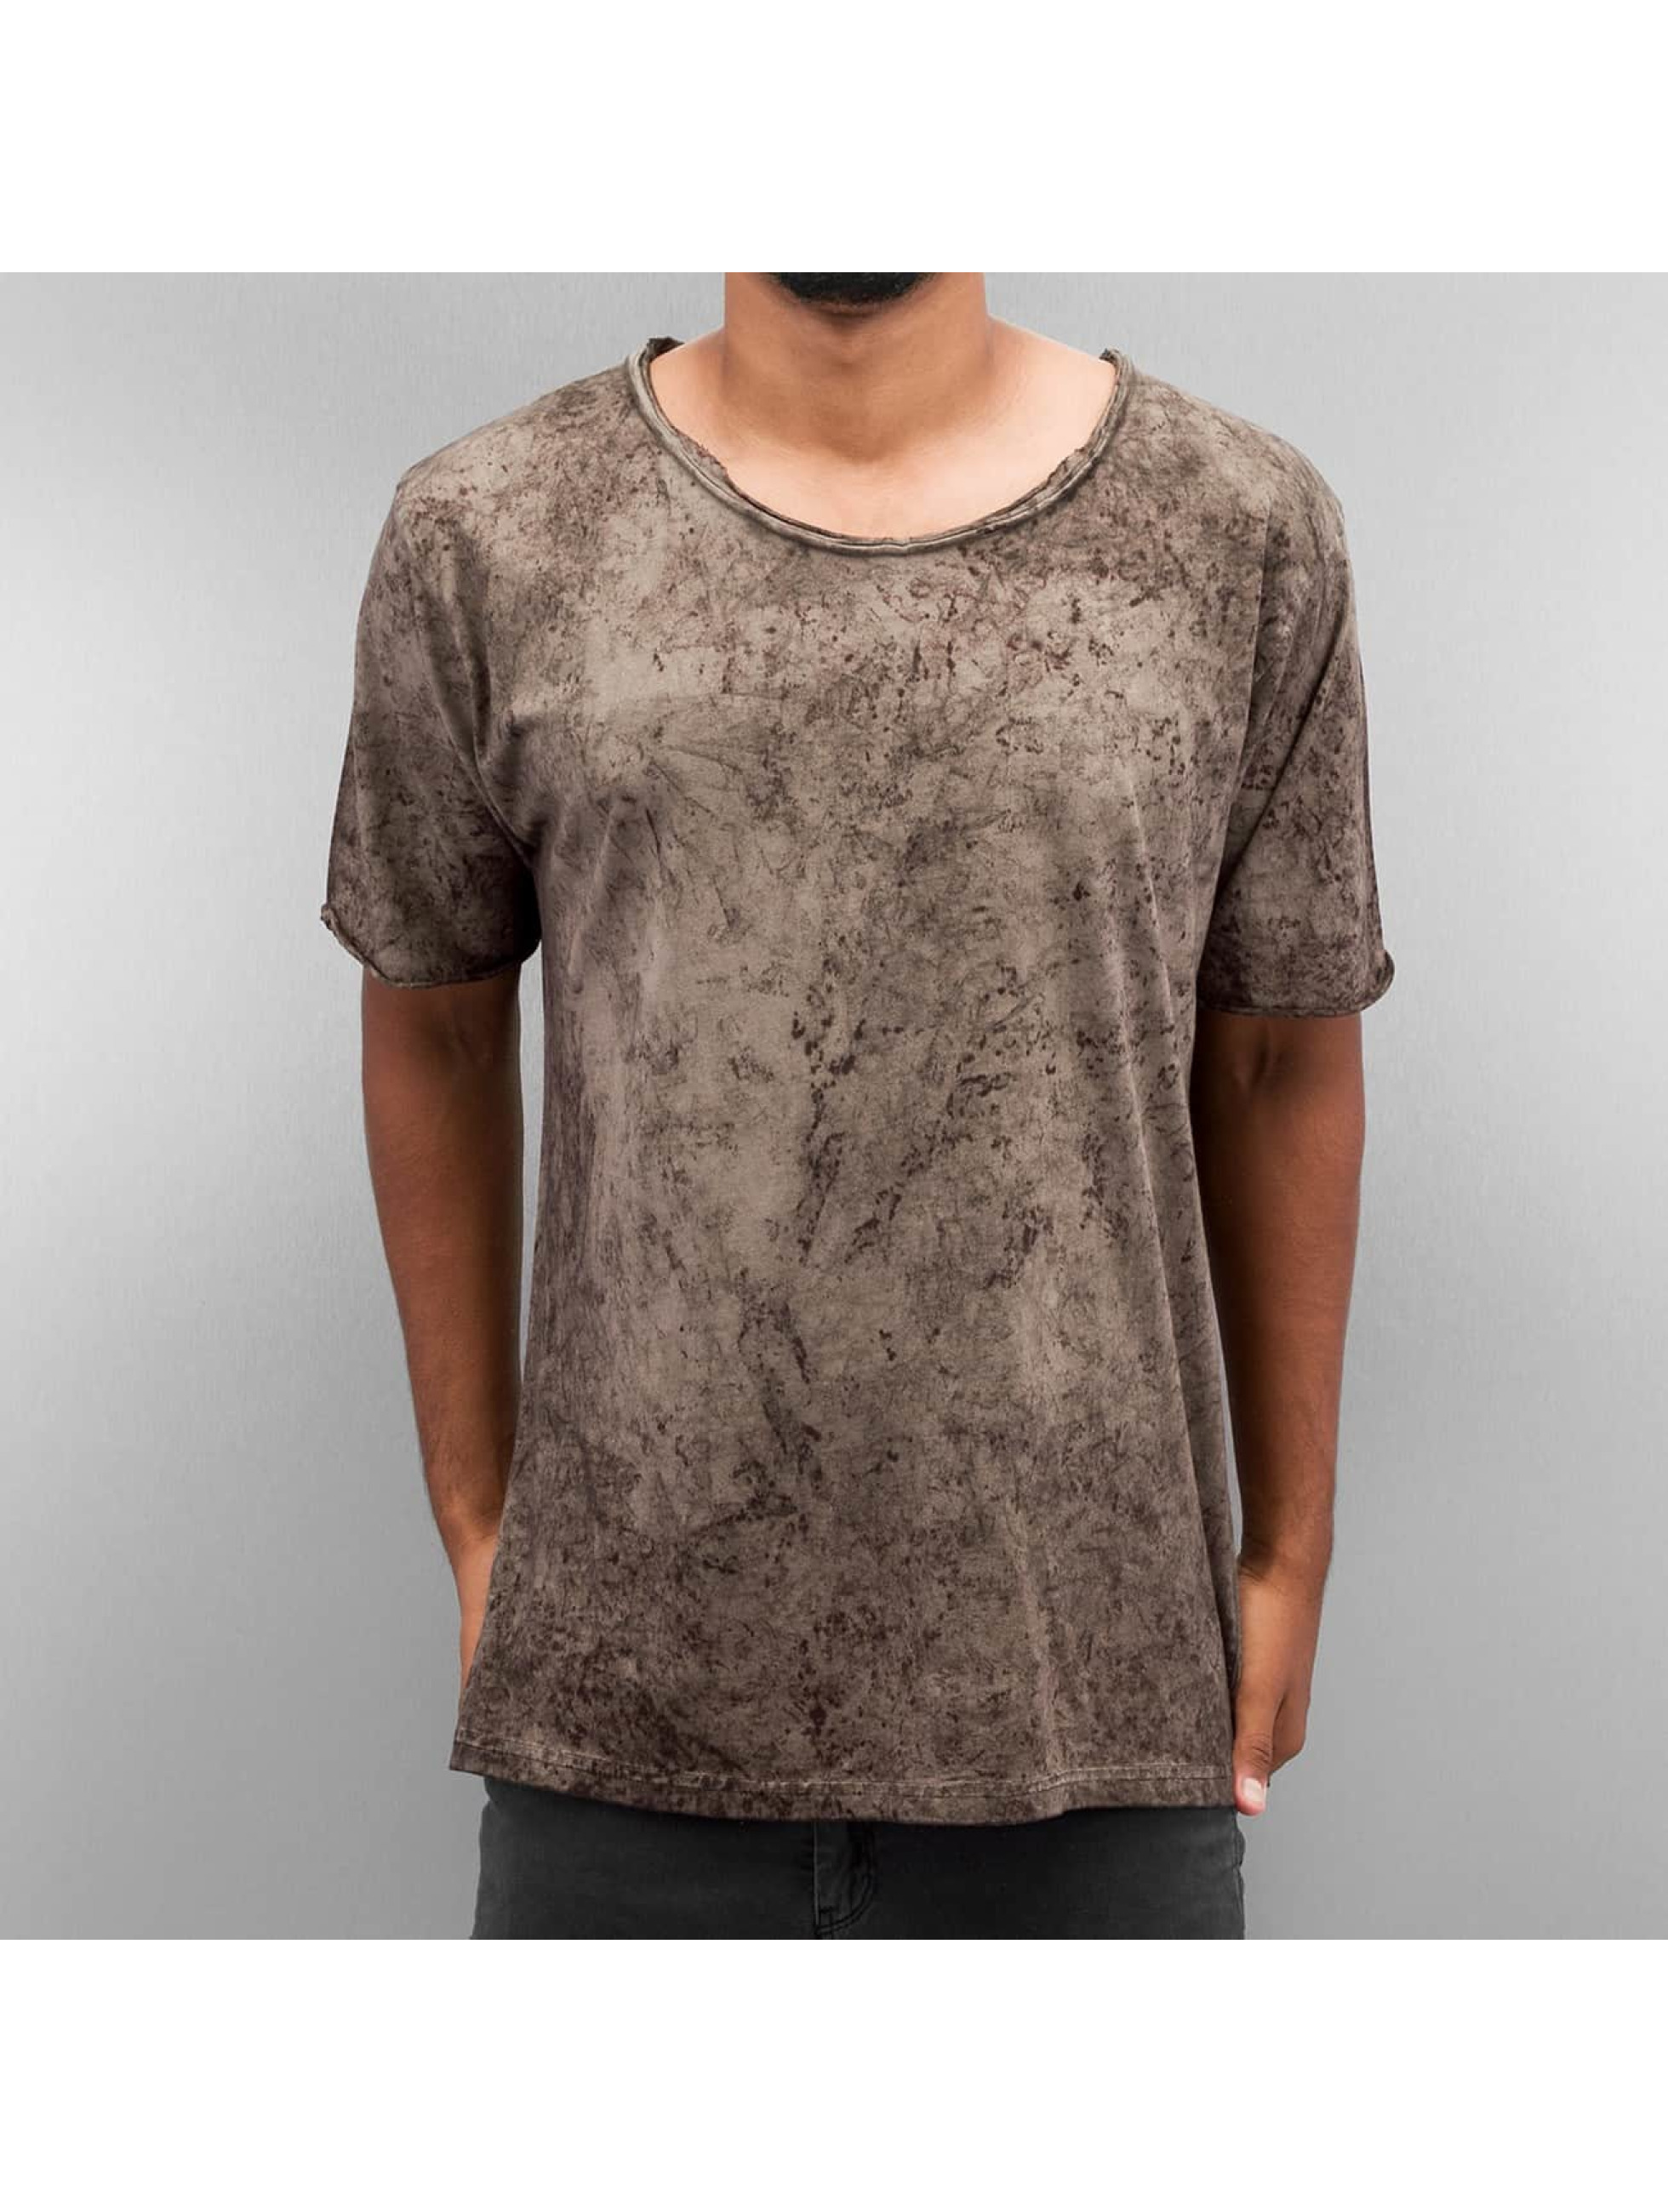 Yezz T-Shirt Marble gris